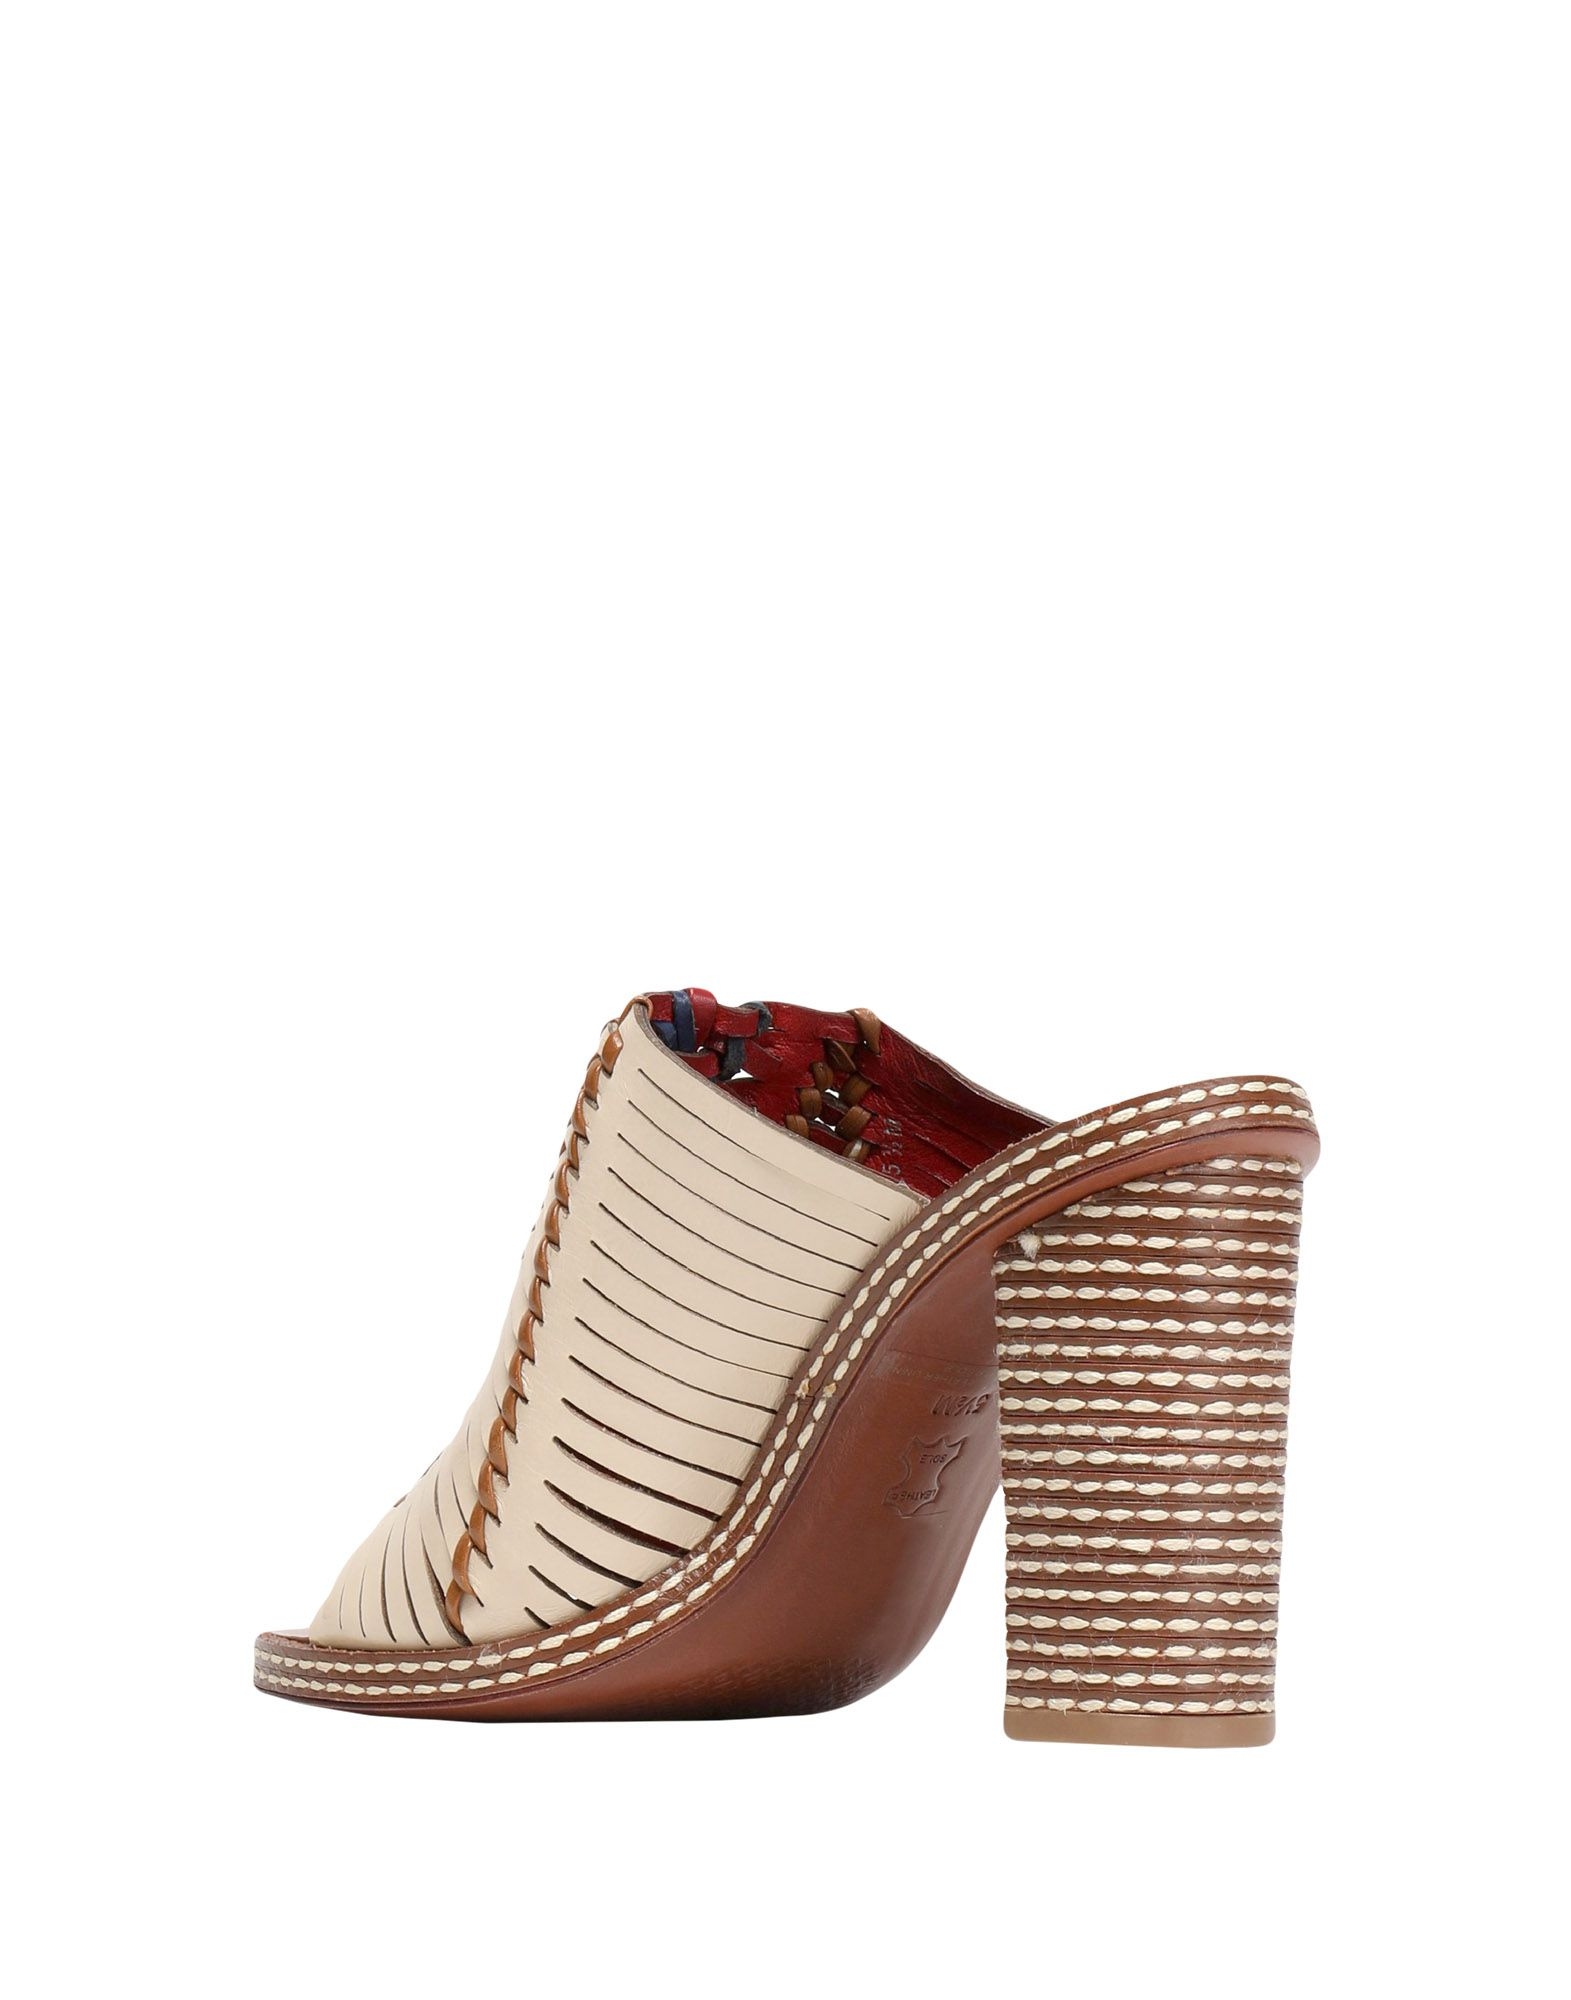 Tory Burch Burch Burch Sandals - Women Tory Burch Sandals online on  United Kingdom - 11526321FD b174d3